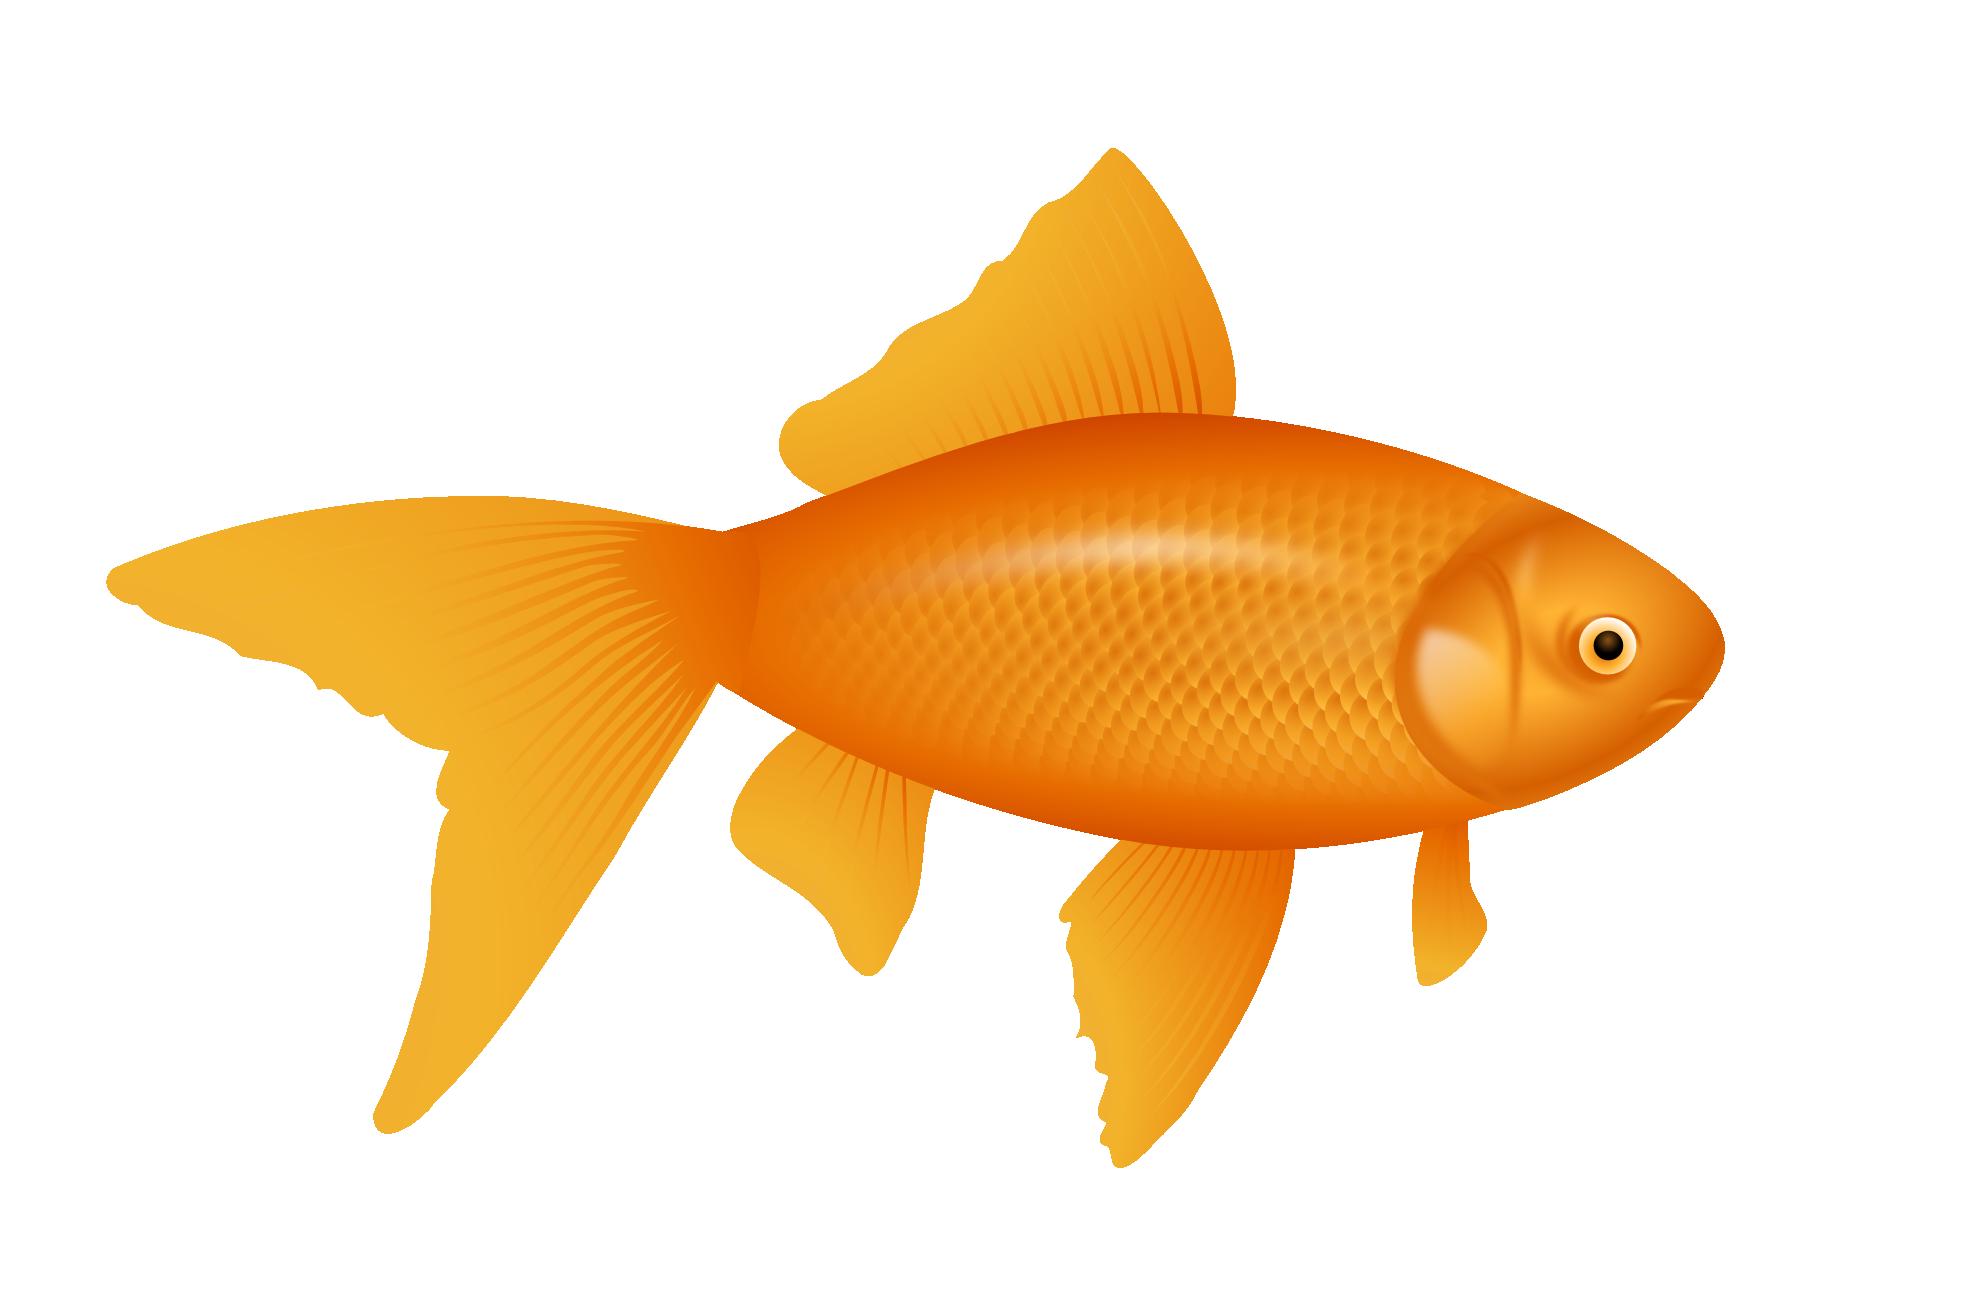 Fish Images Google Search Fish Wallpaper Fish Red Fish